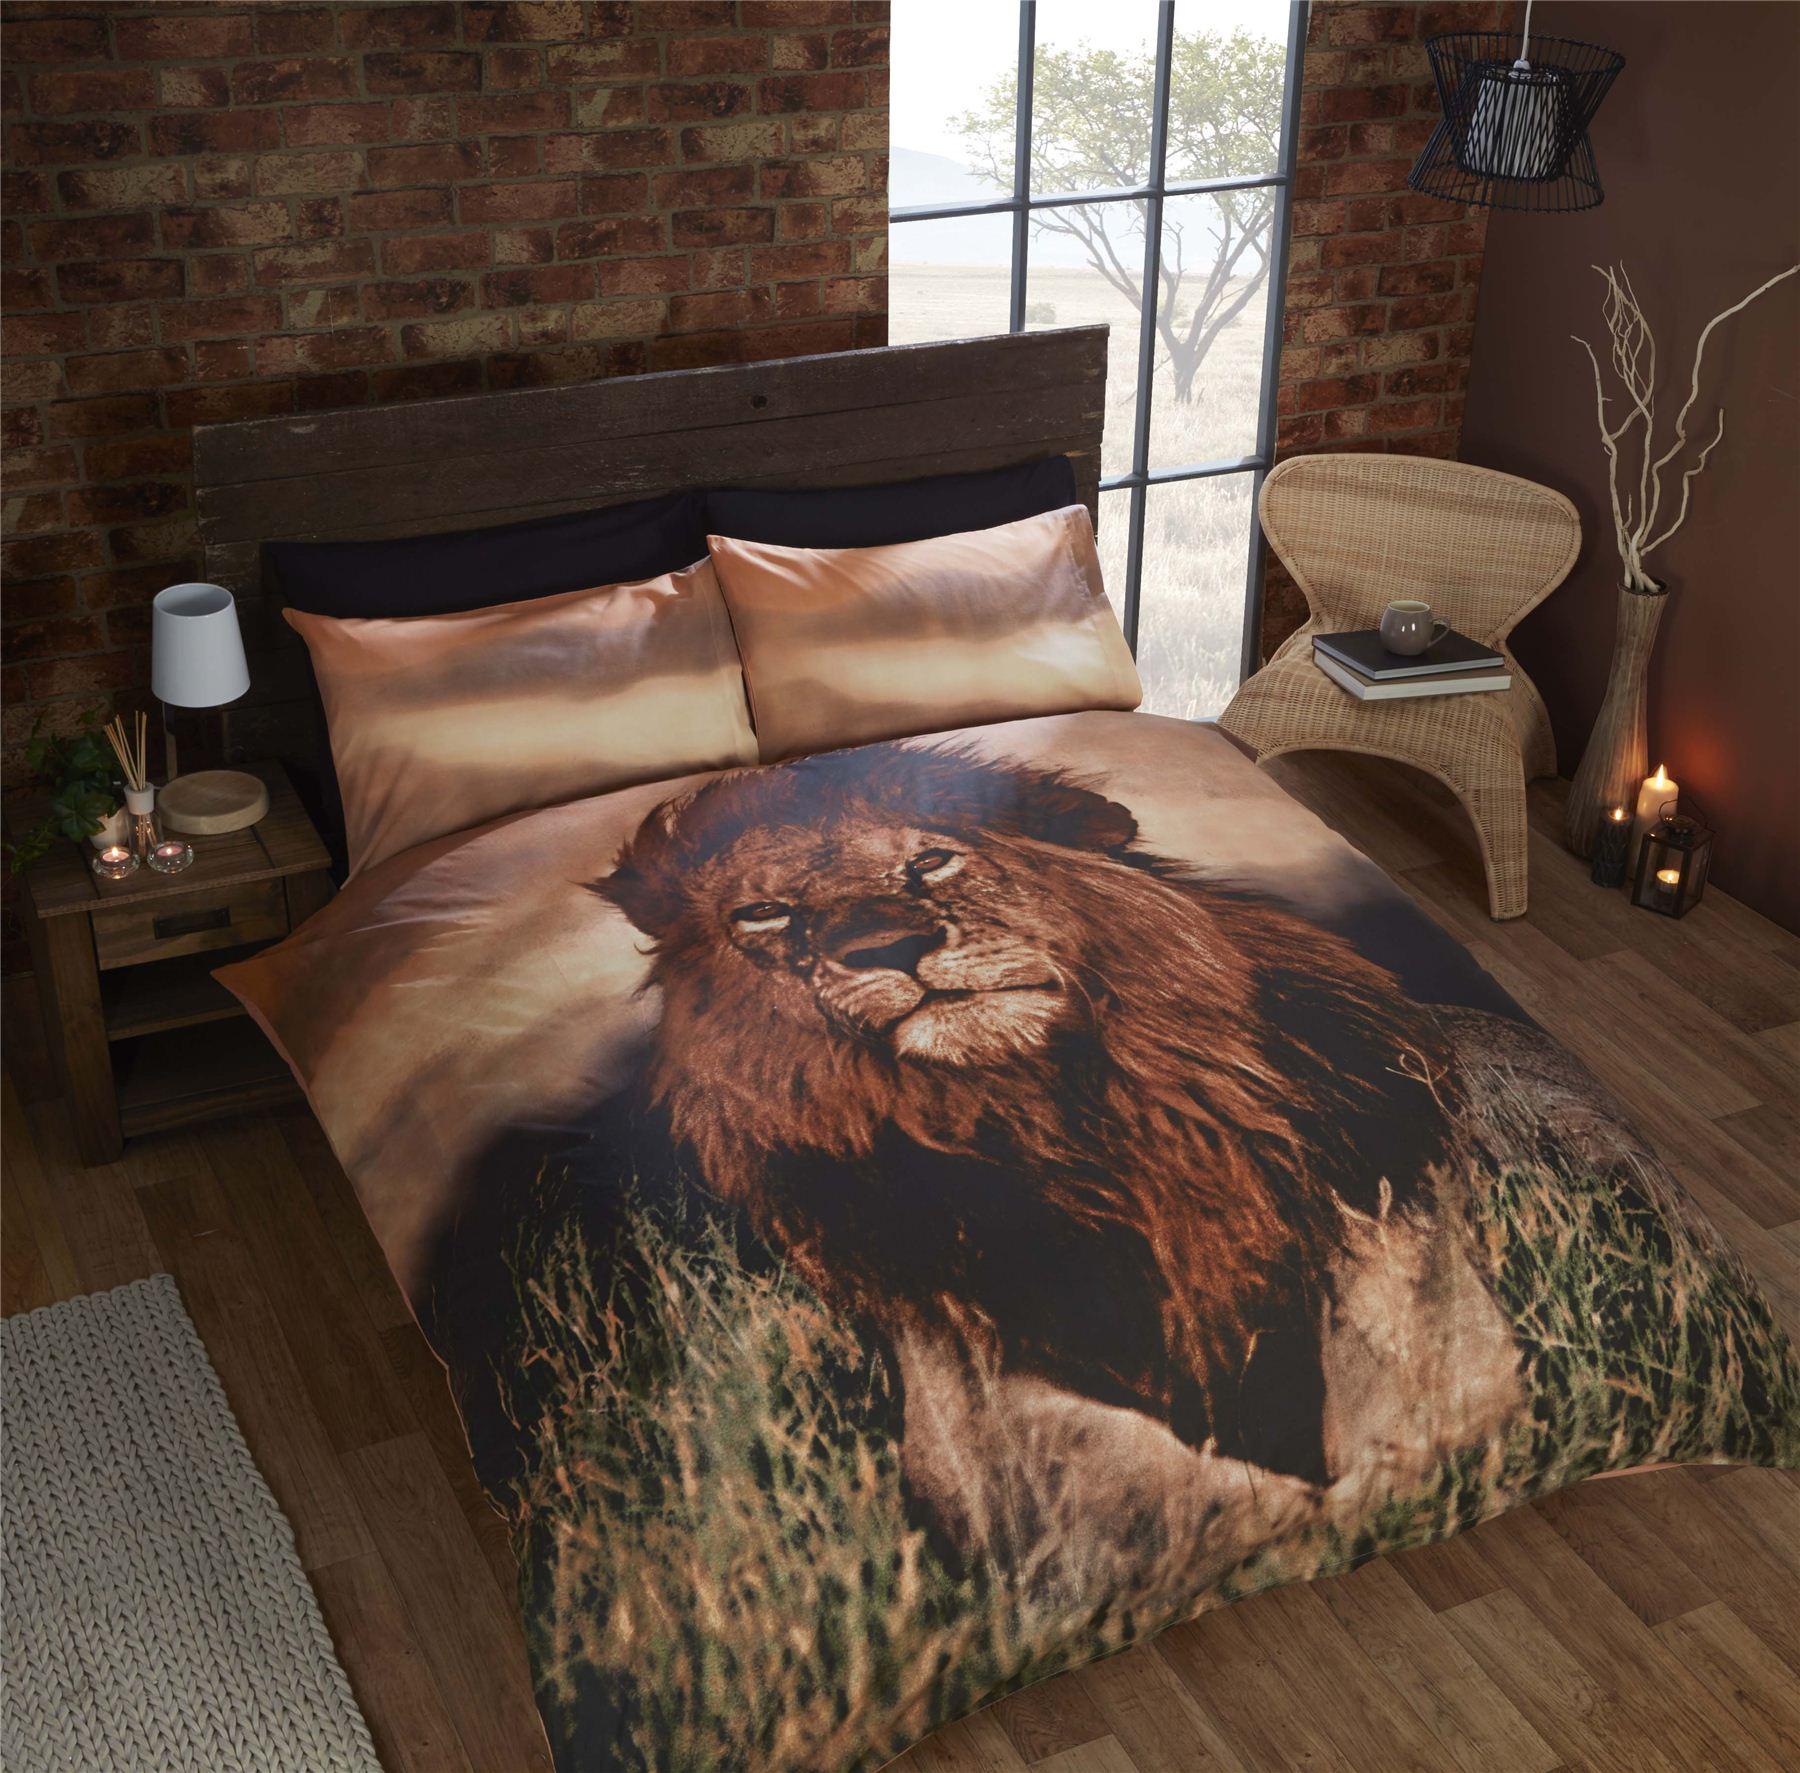 Aslan lion bedding duvet cover photo print wild animal for Wild bedding